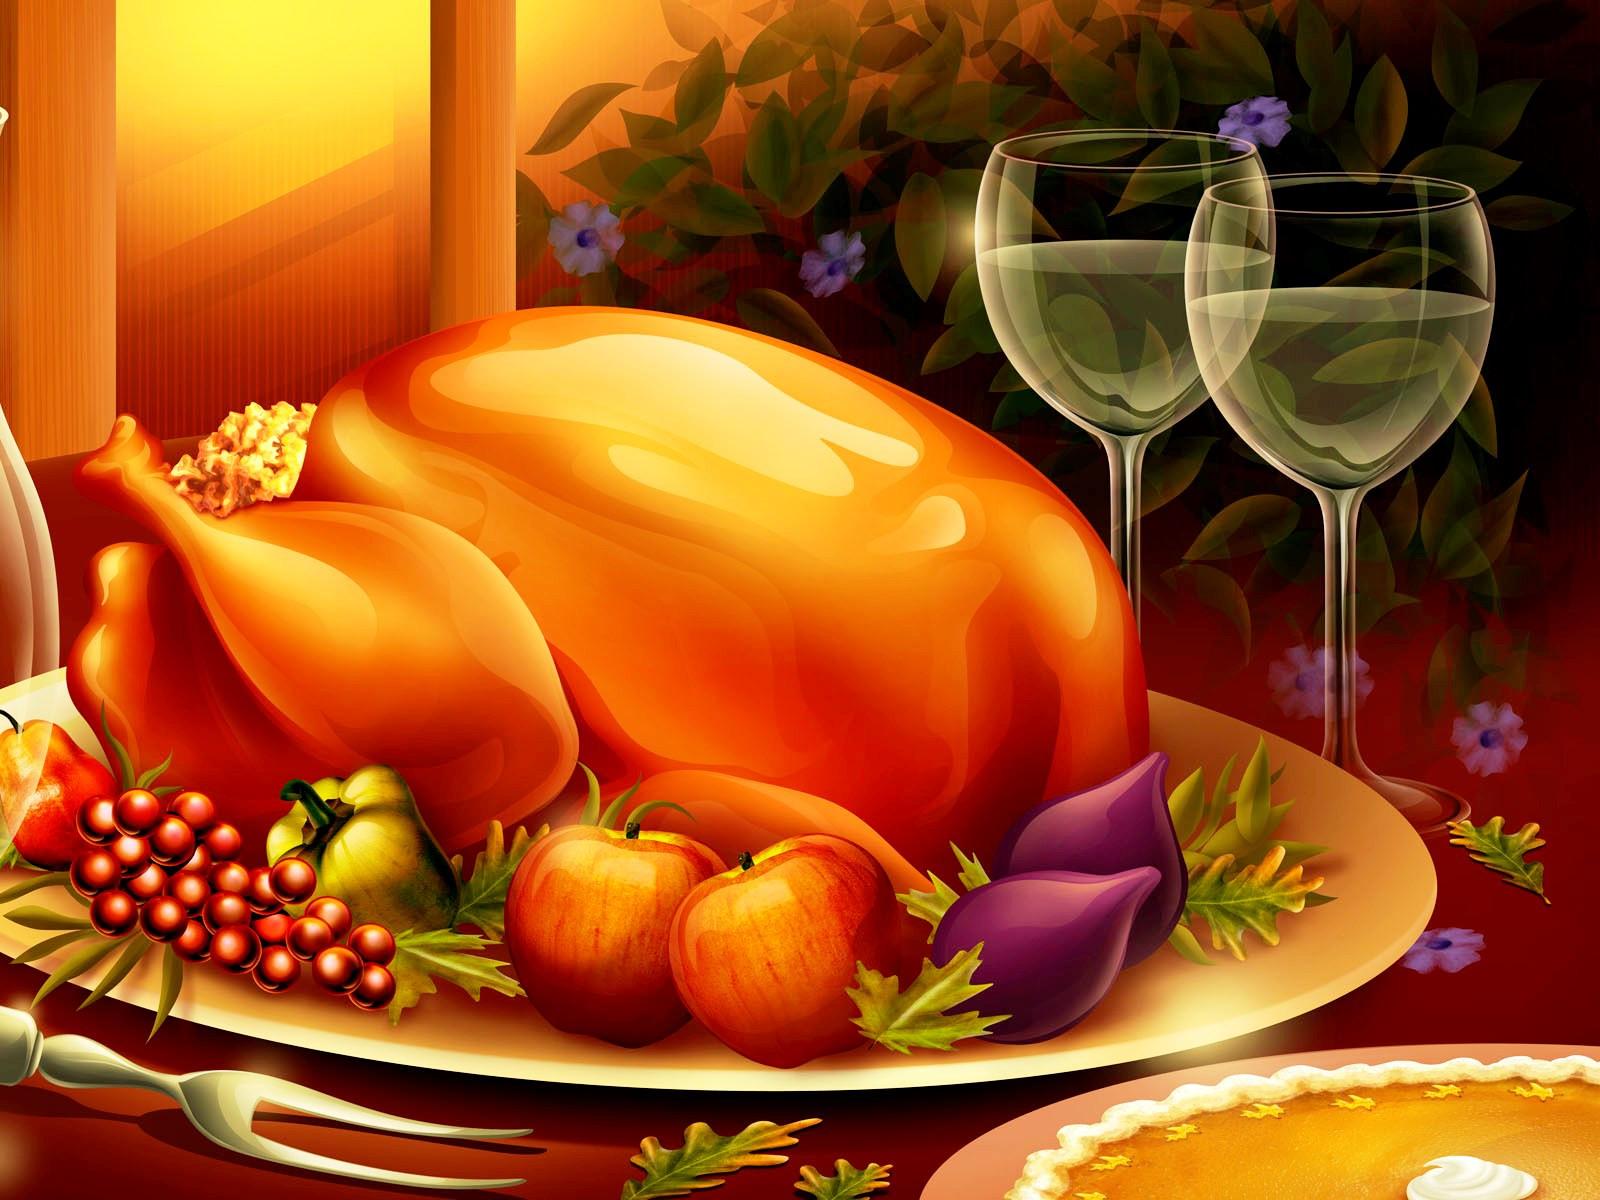 Thanksgiving Turkey Wallpaper  3D Thanksgiving Wallpapers HD